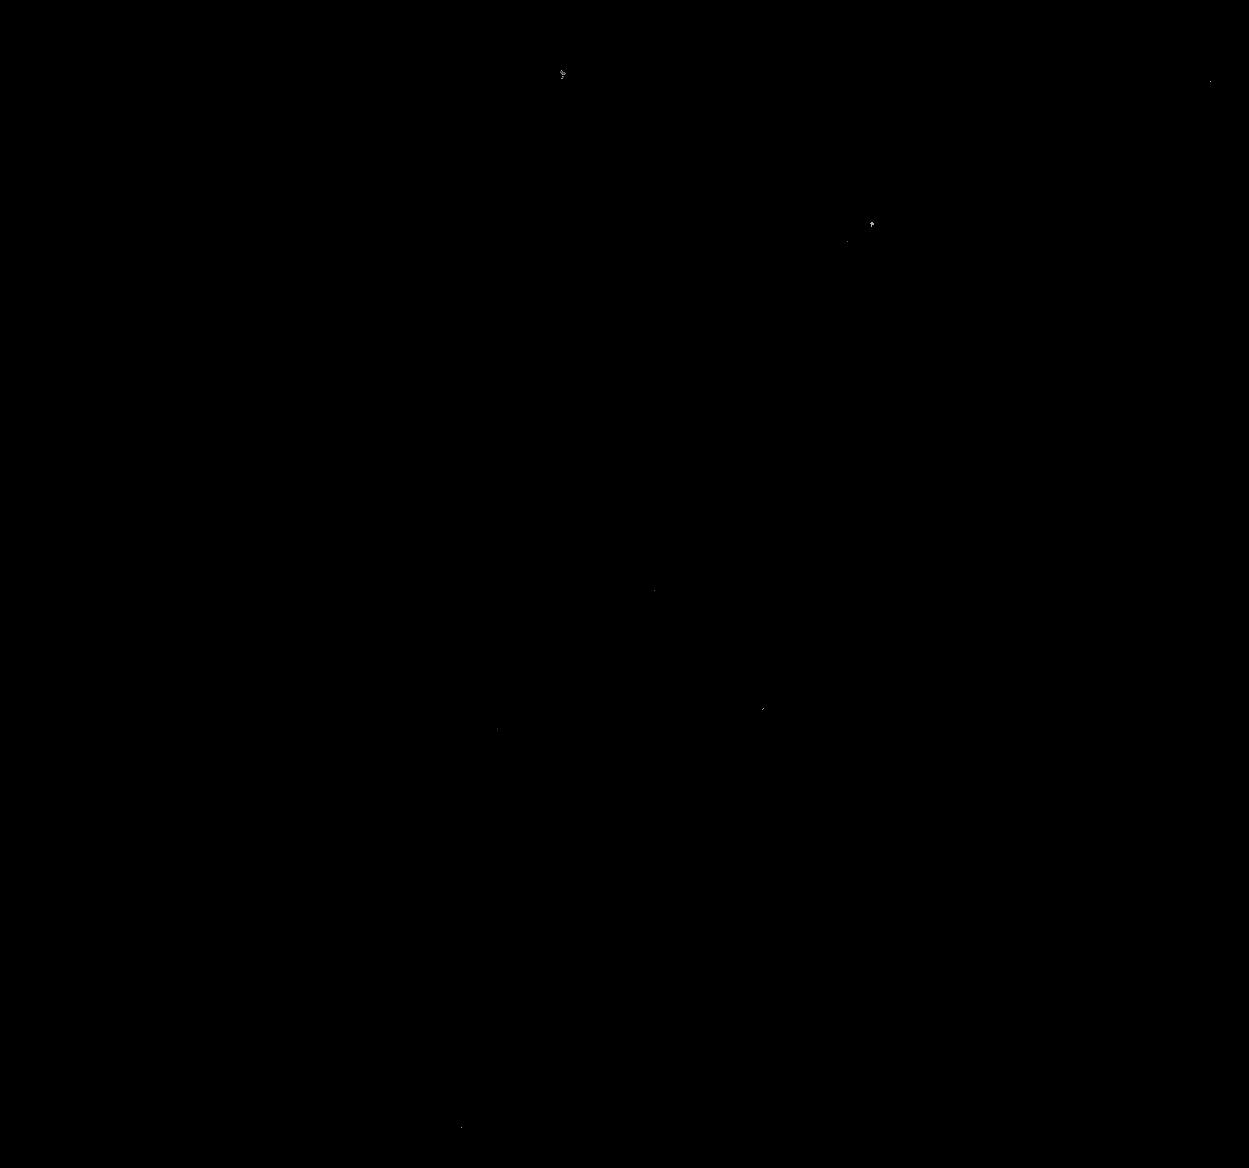 pok u00e9mon light and shadow  pok u00e9dex - fantendo  the nintendo fanon wiki